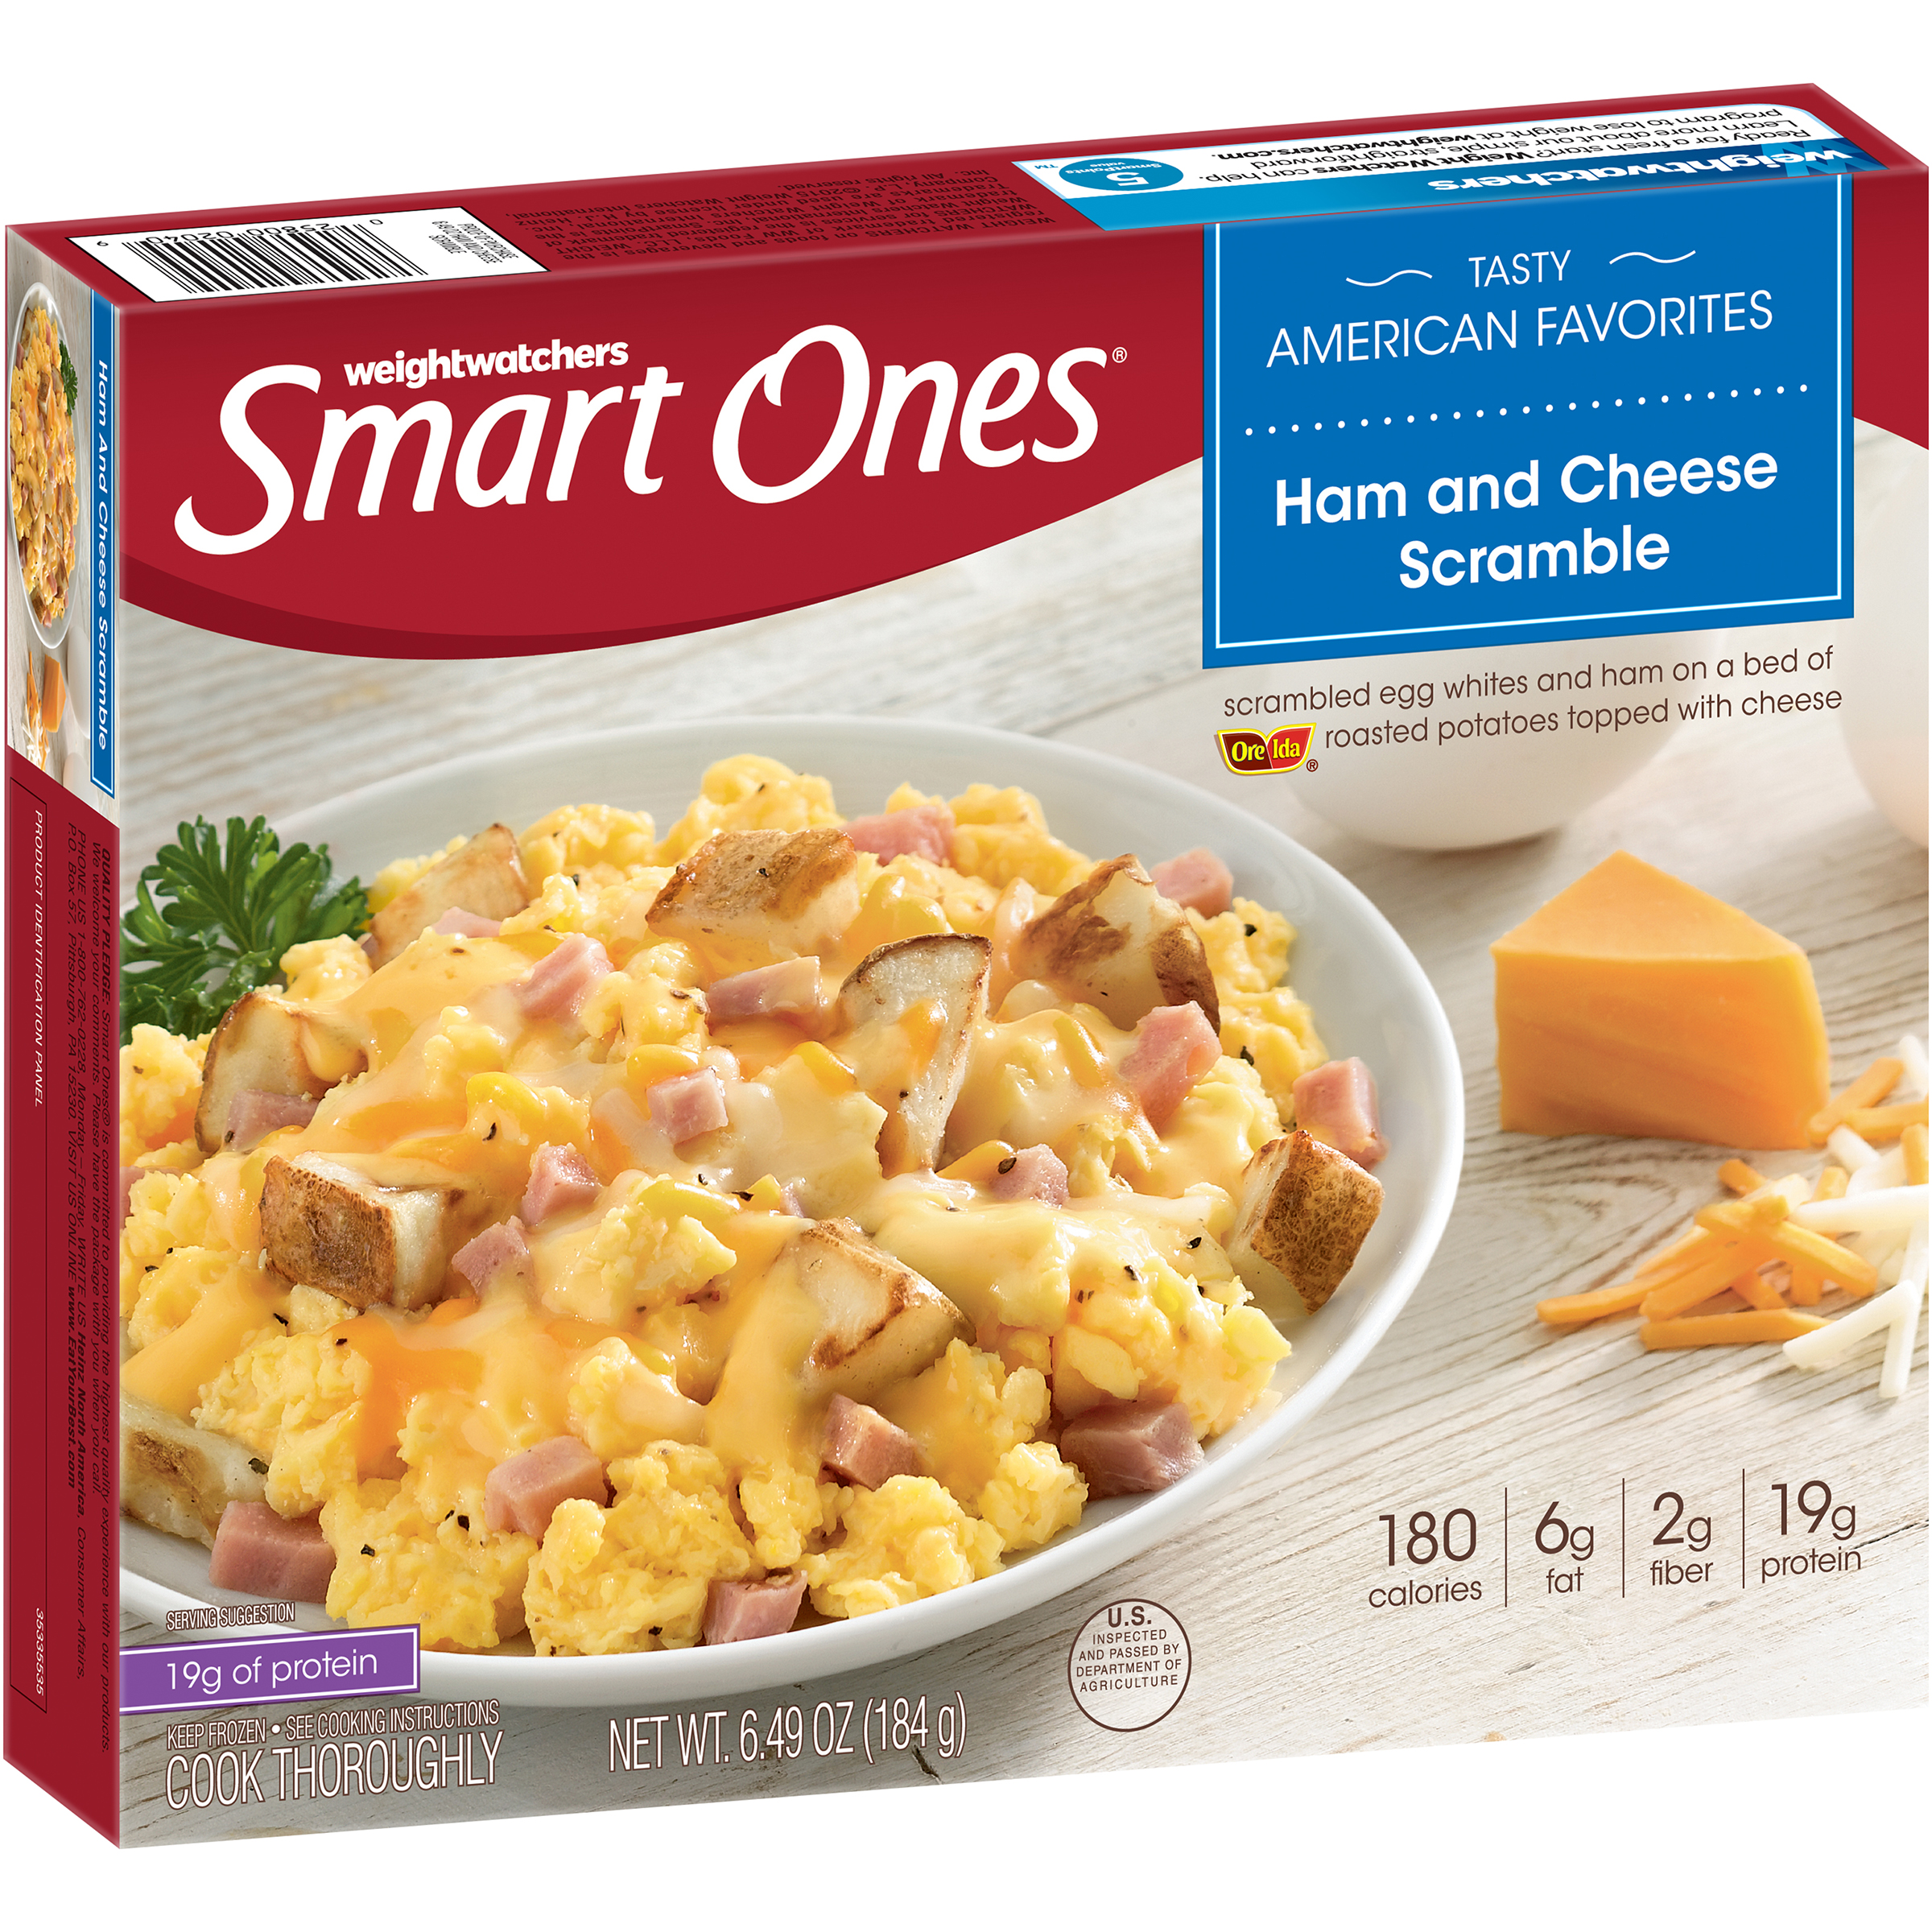 Weight watchers microwave meals bestmicrowave - Cuisine weight watchers ...